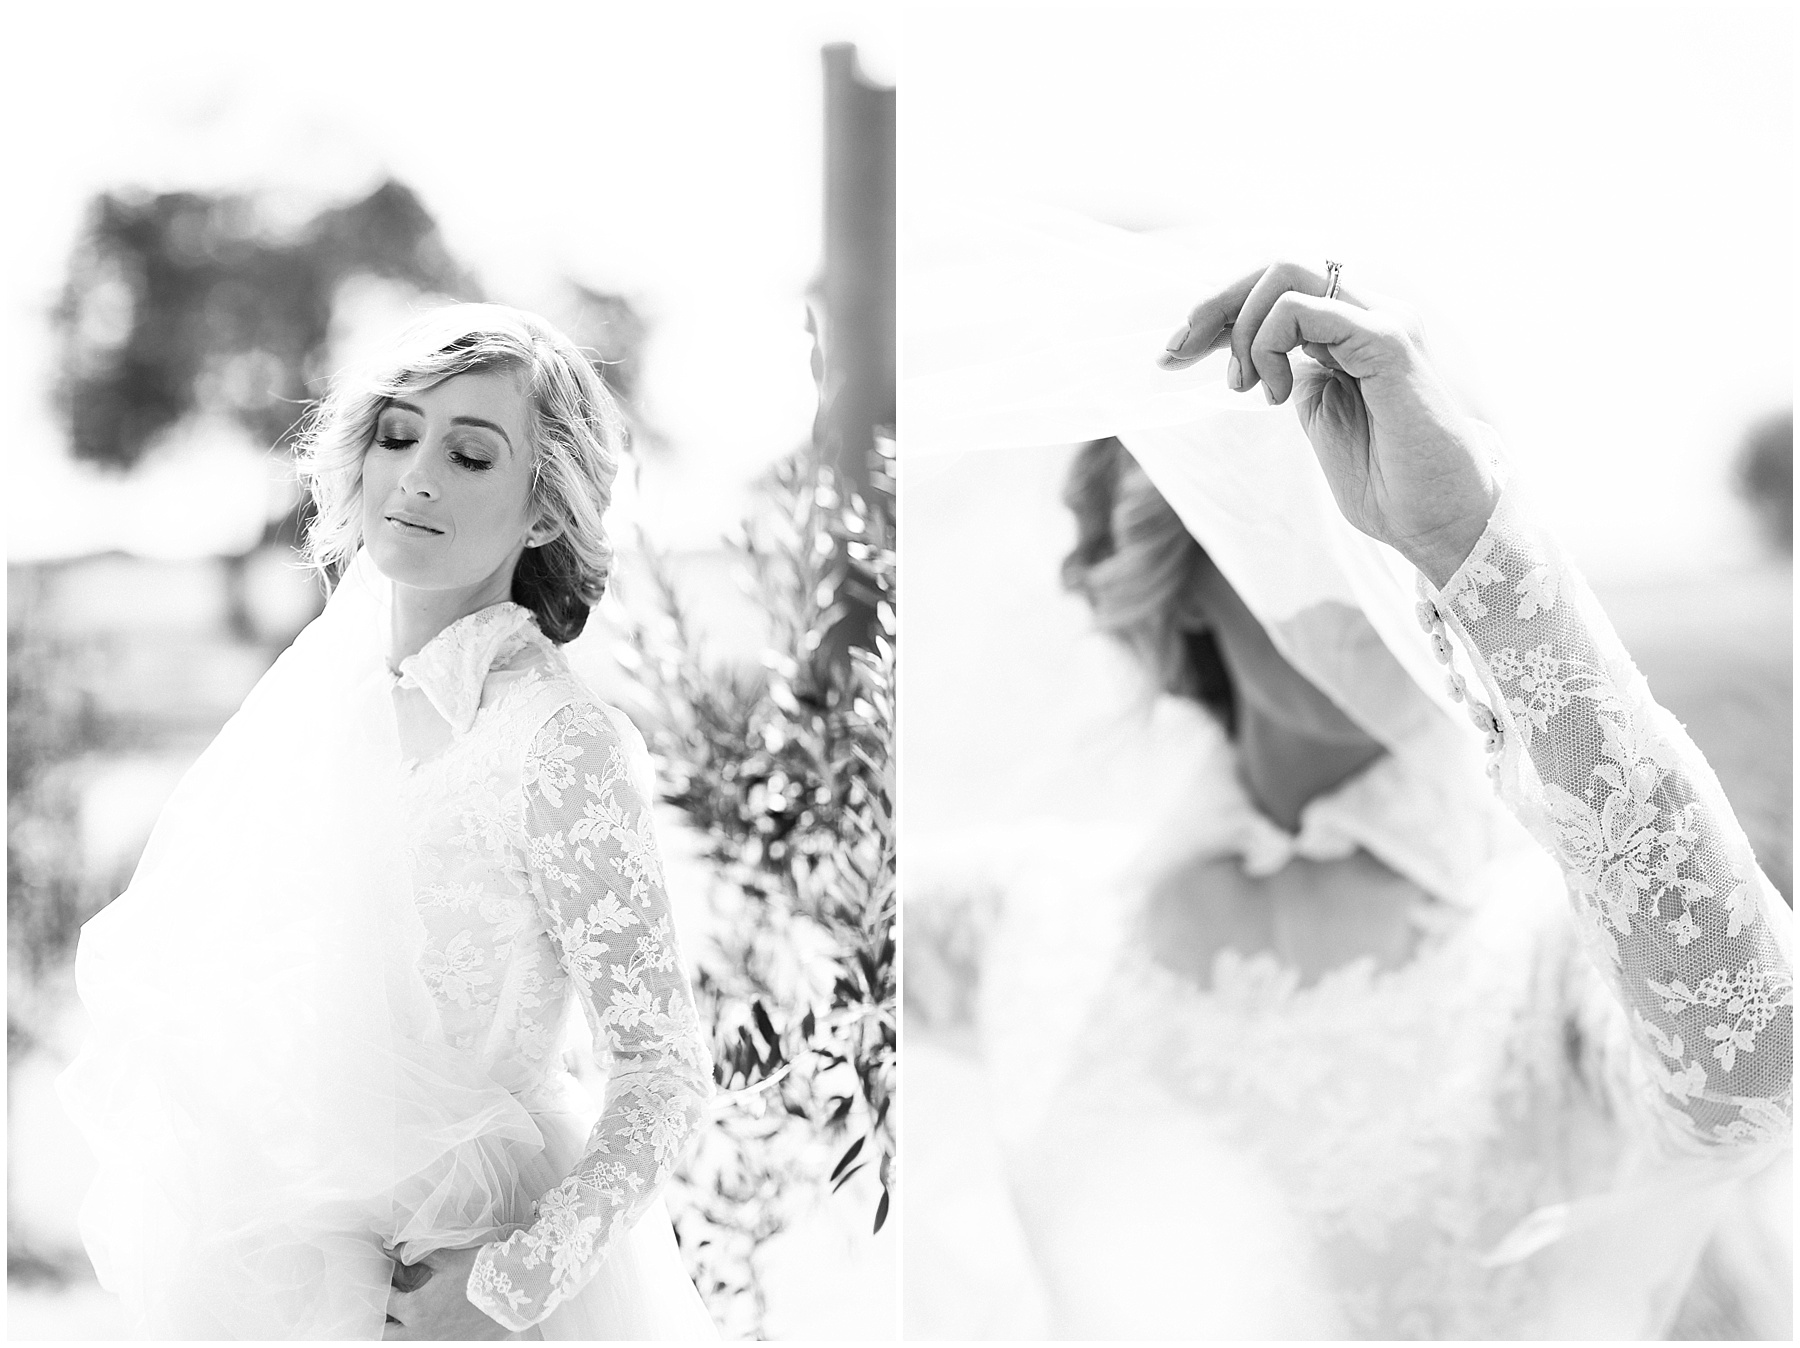 AliciaLandman_JoleneandZander_Wedding_The Pretty Blog_0427.jpg